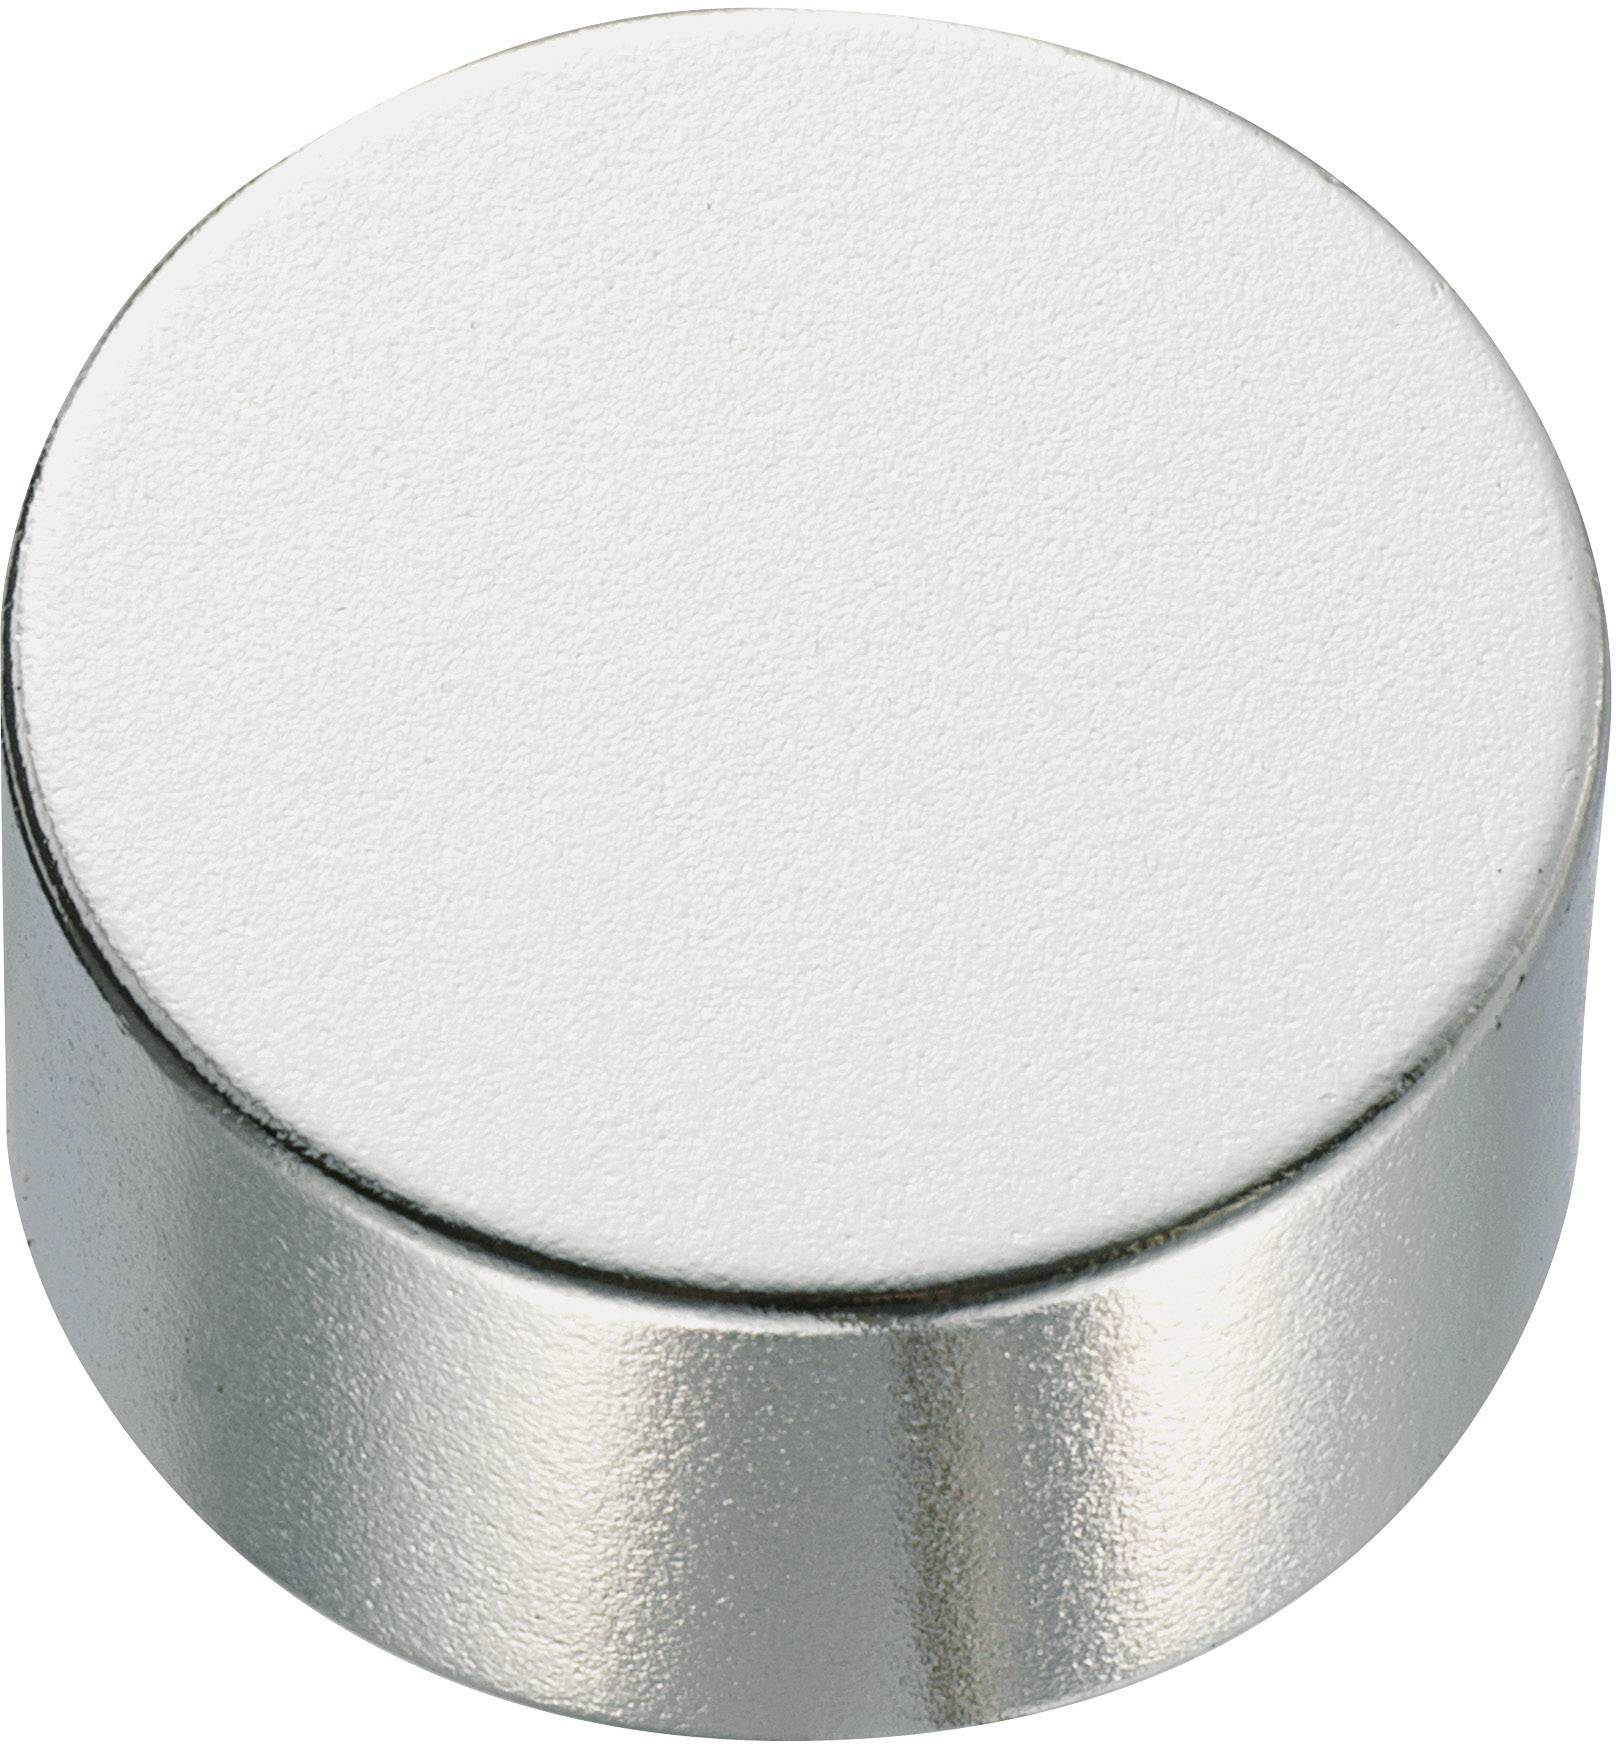 Permanentný magnet, N35, 10 x 10 mm, valcový